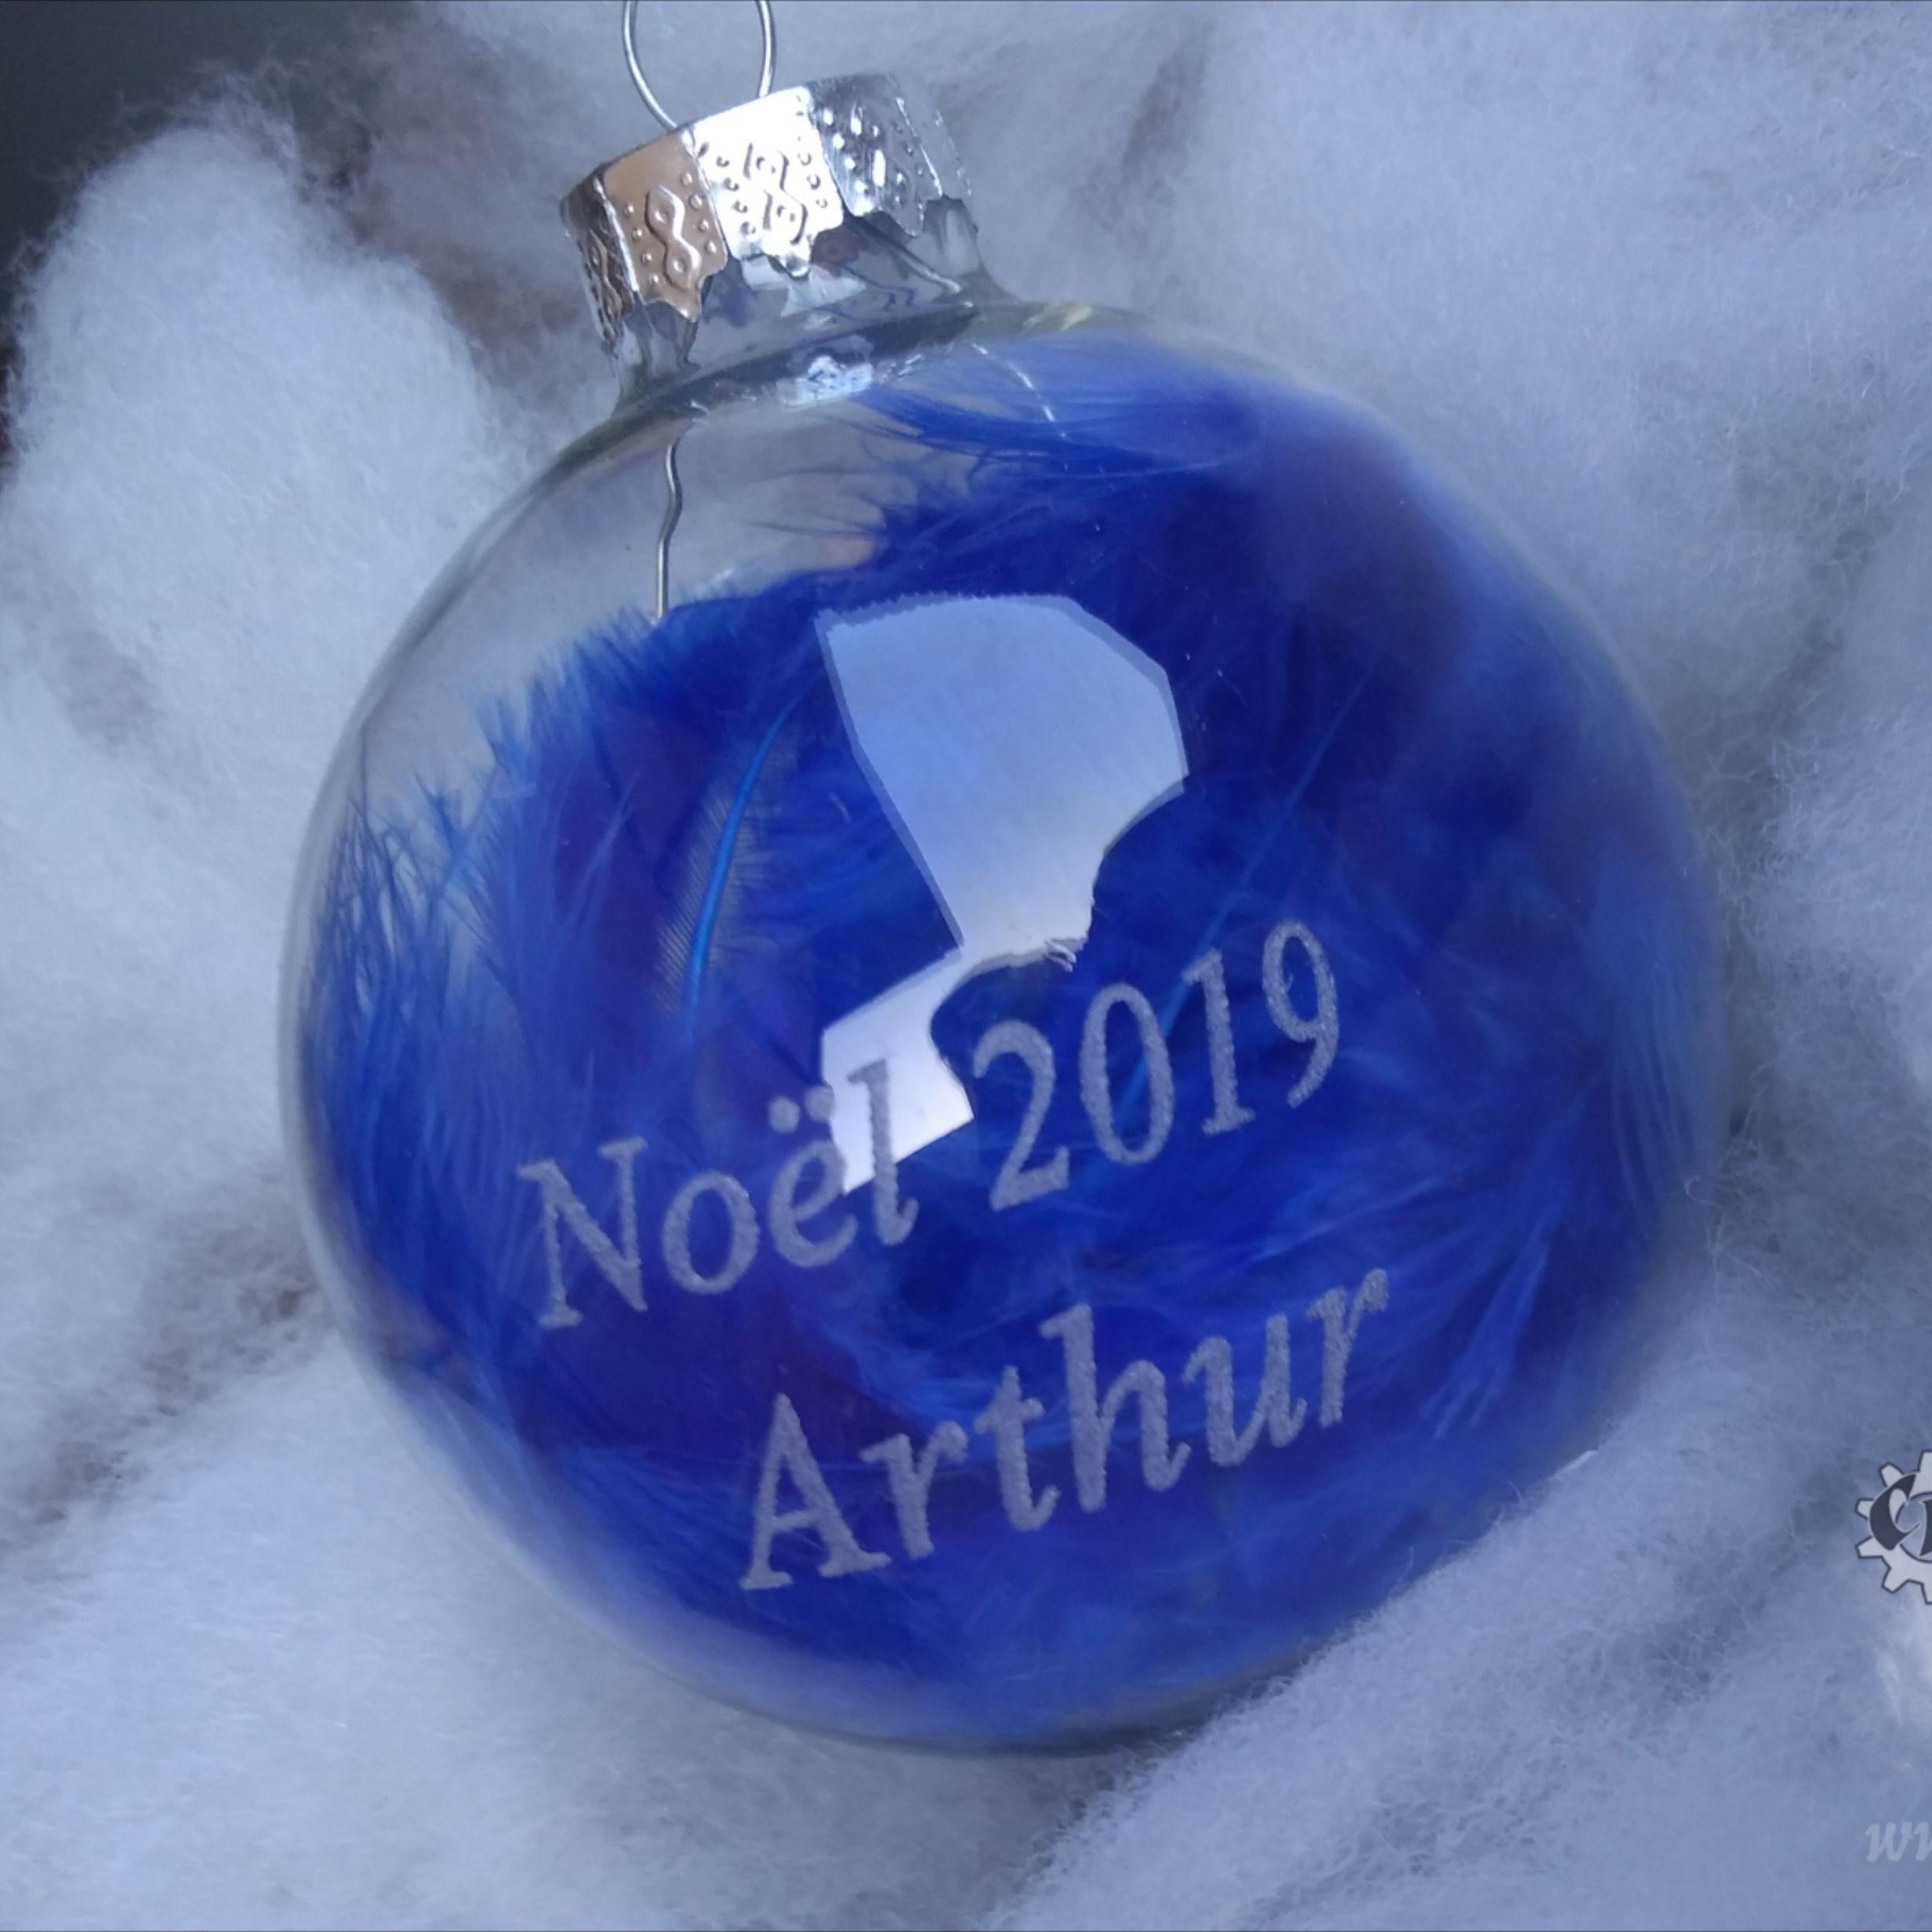 Boule de Noël | Boules de noël en verre, Boule de noel, Gravure